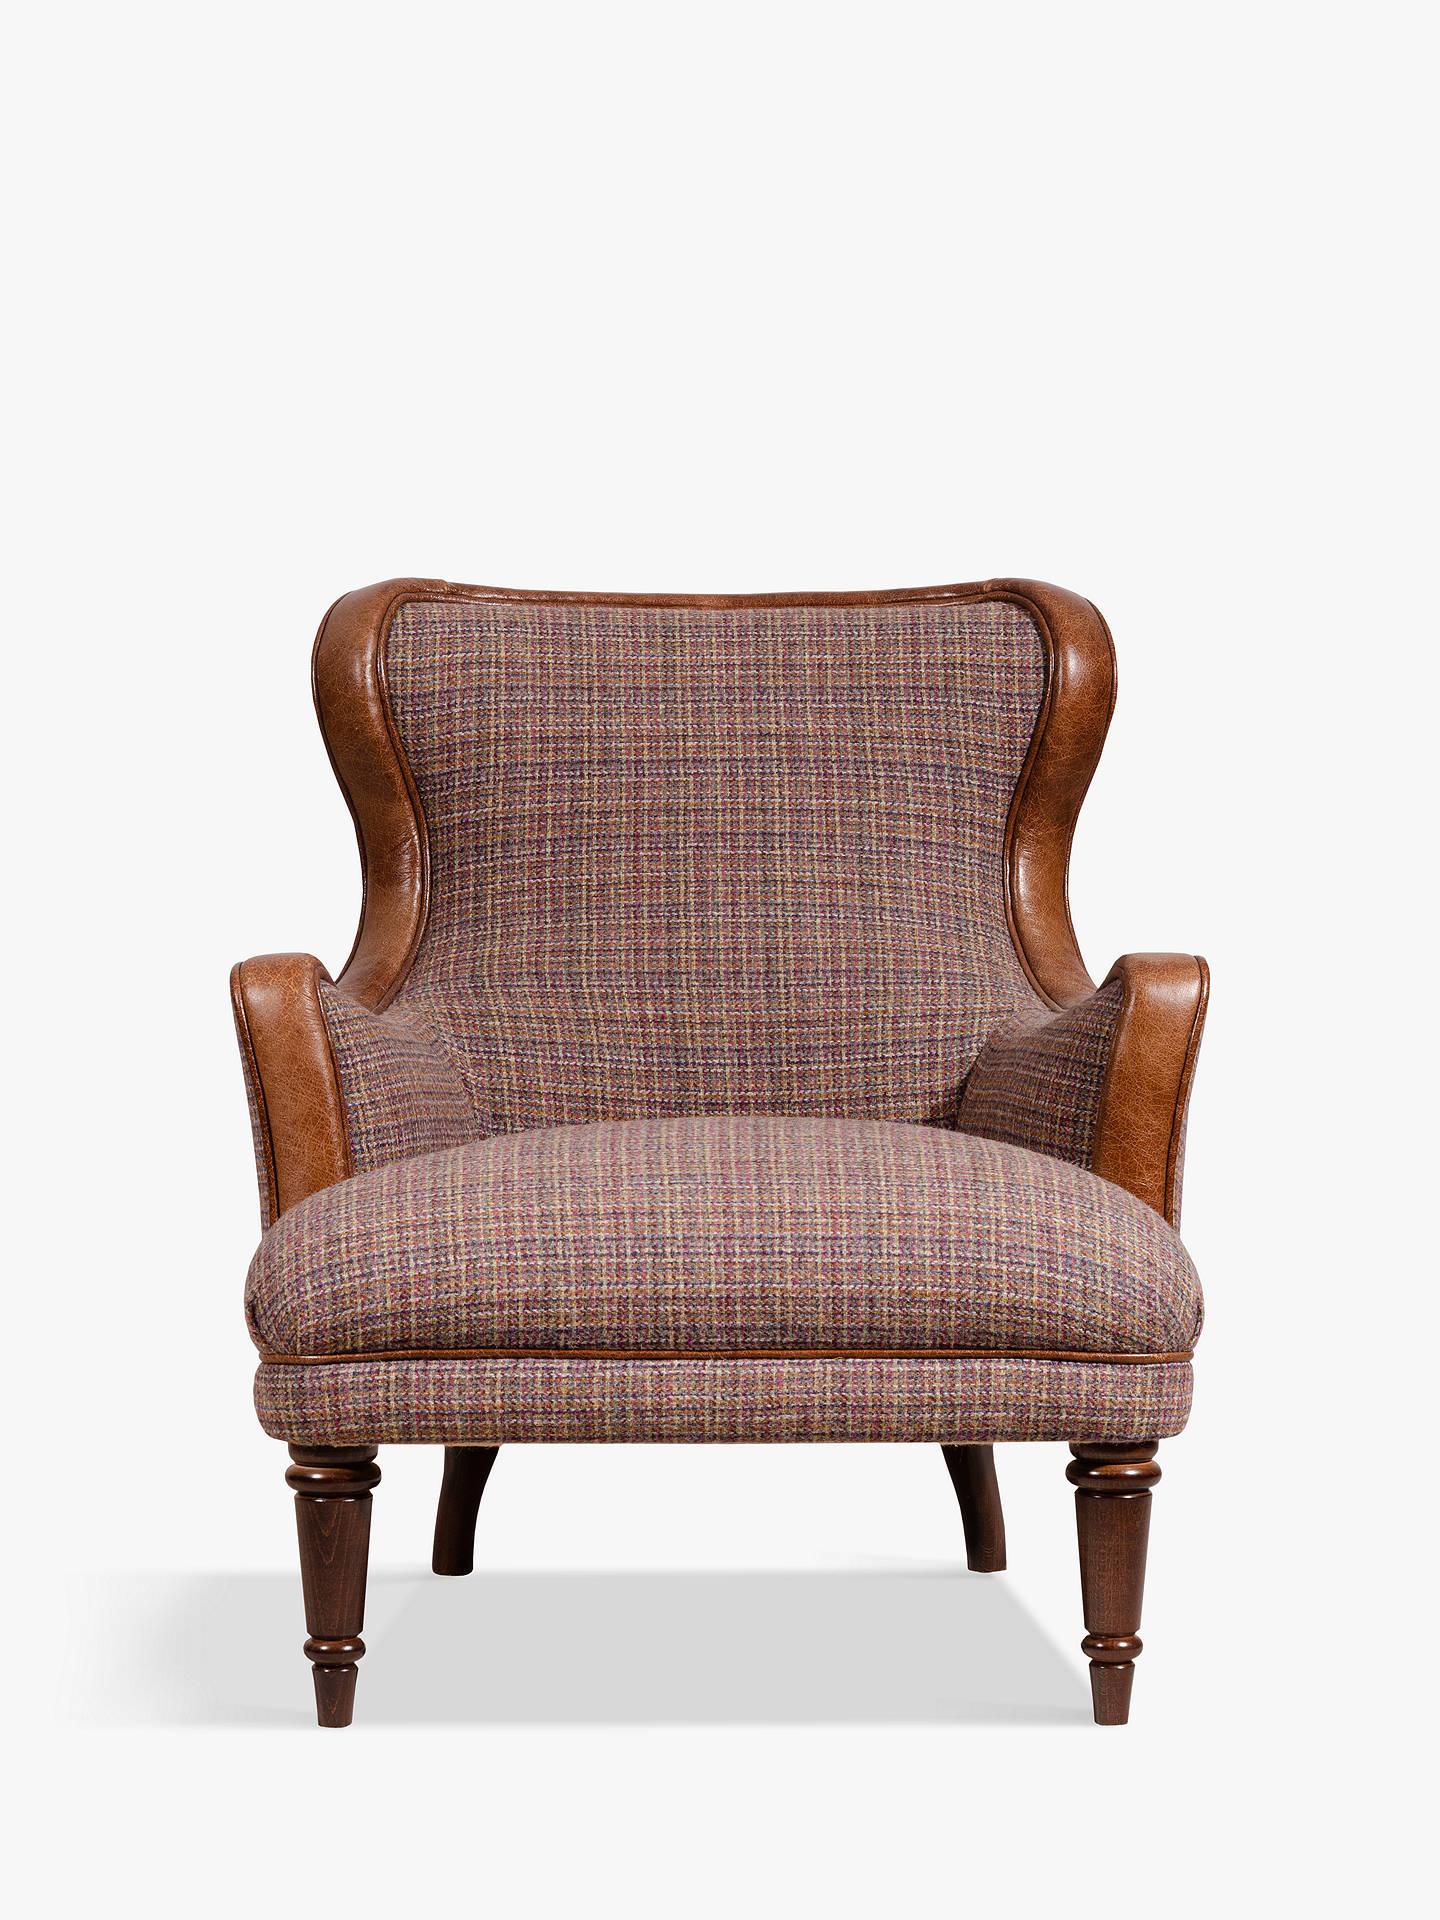 Tetrad Harris Tweed Cavendish Armchair Calluna Bramble With Brompton Leather Trim Online At Johnlewis